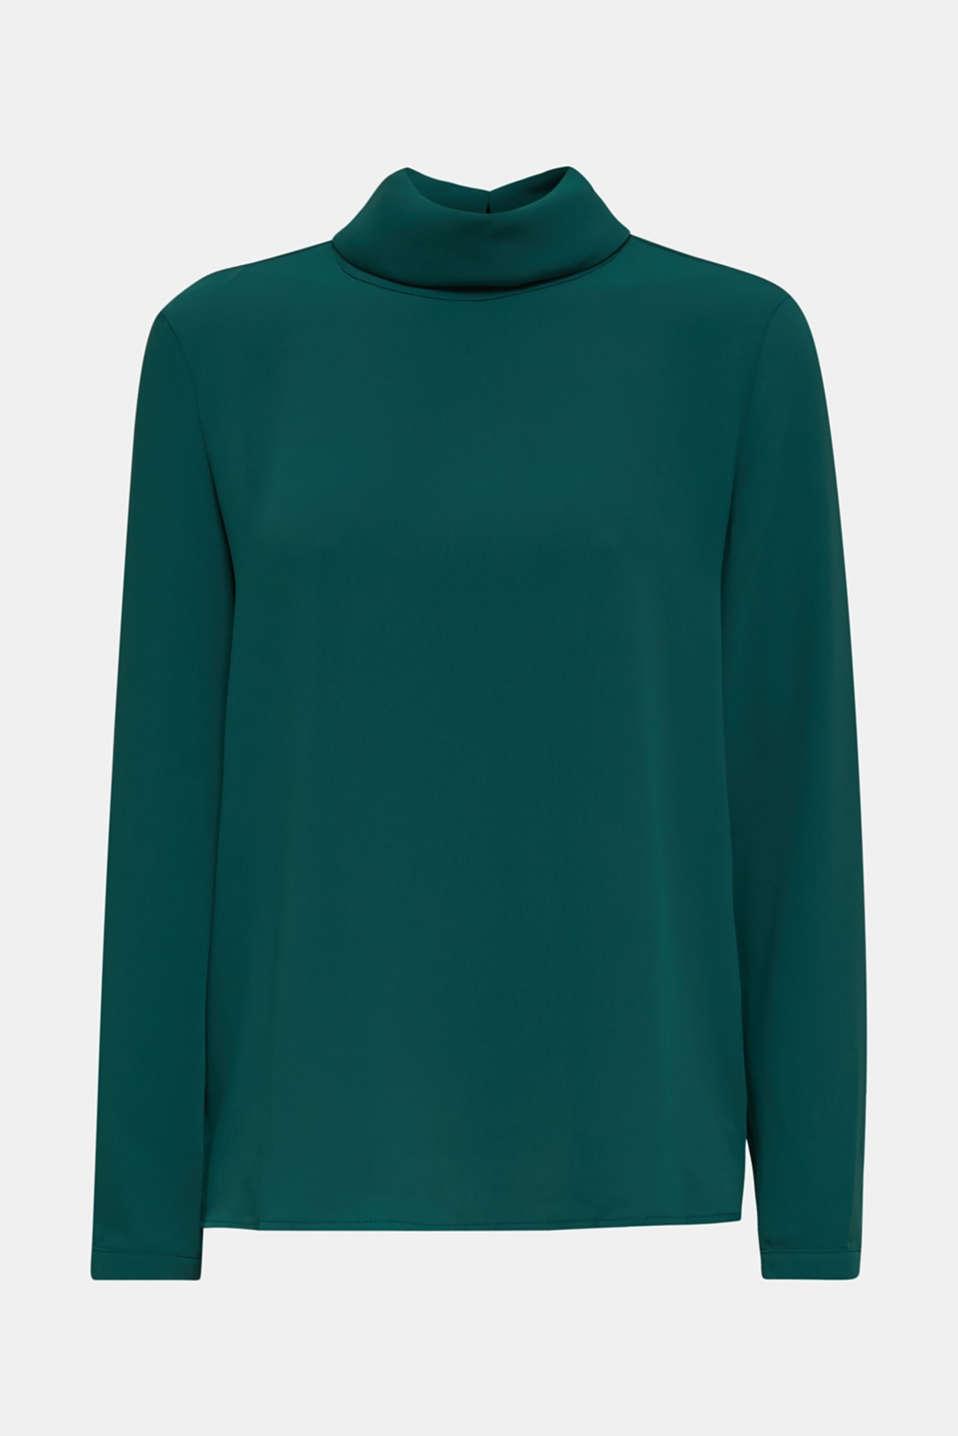 Blouses woven, BOTTLE GREEN, detail image number 6